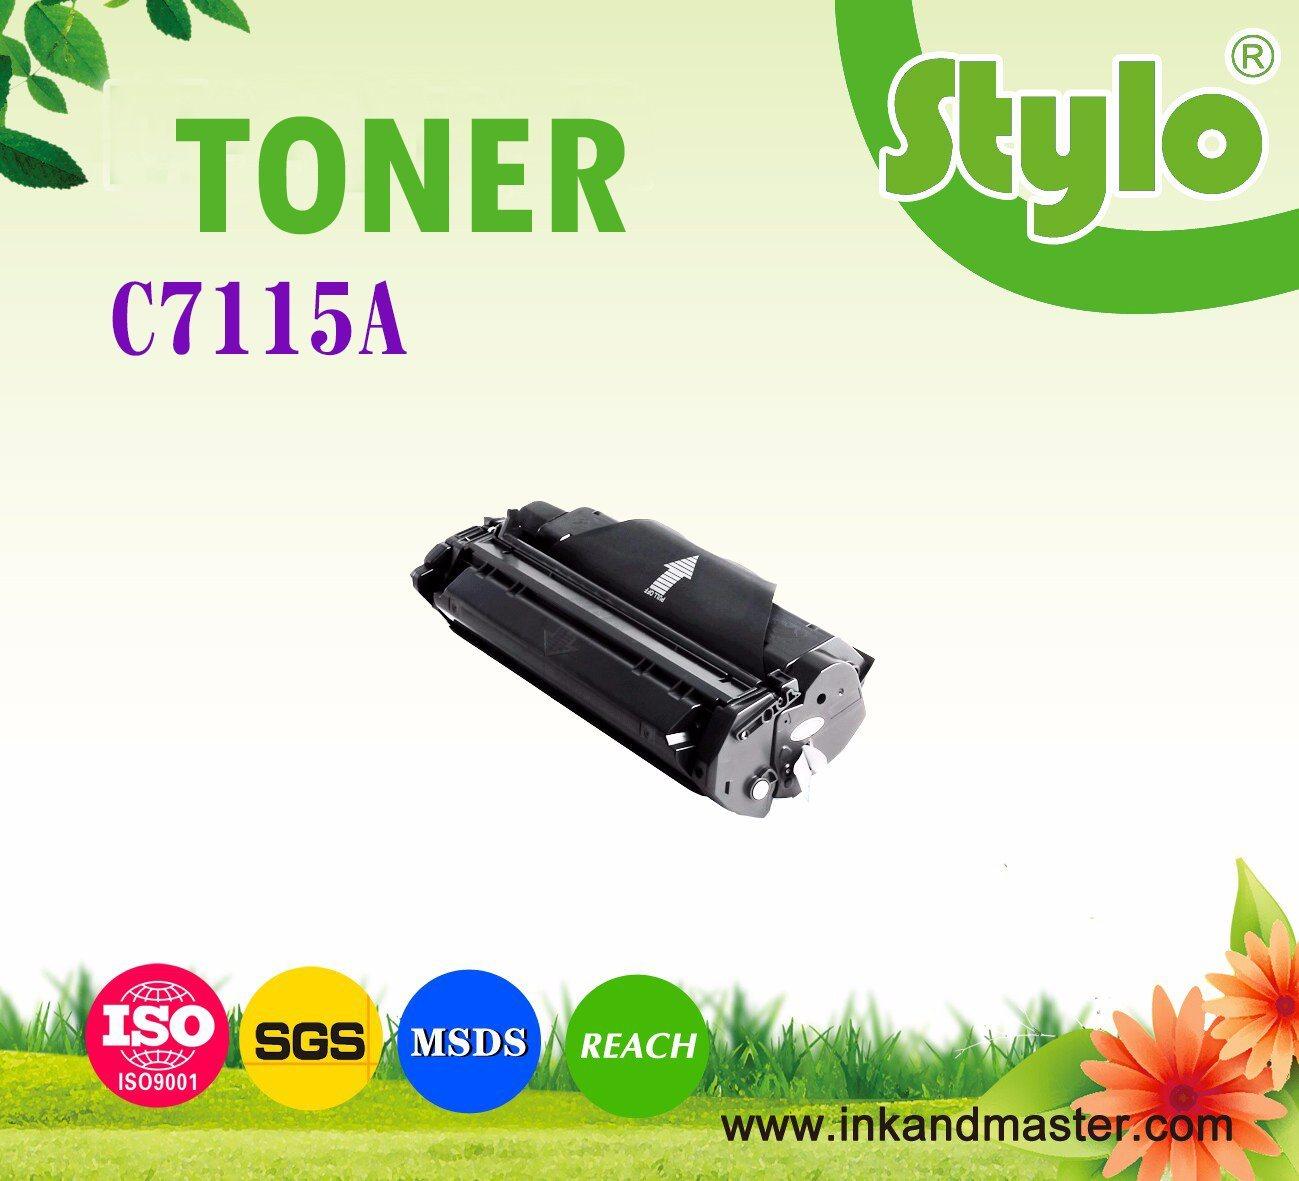 C7115A Laser Printer Toner Cartridge for Use in HP Laserjet 1000/1220/3330/3300 Printer